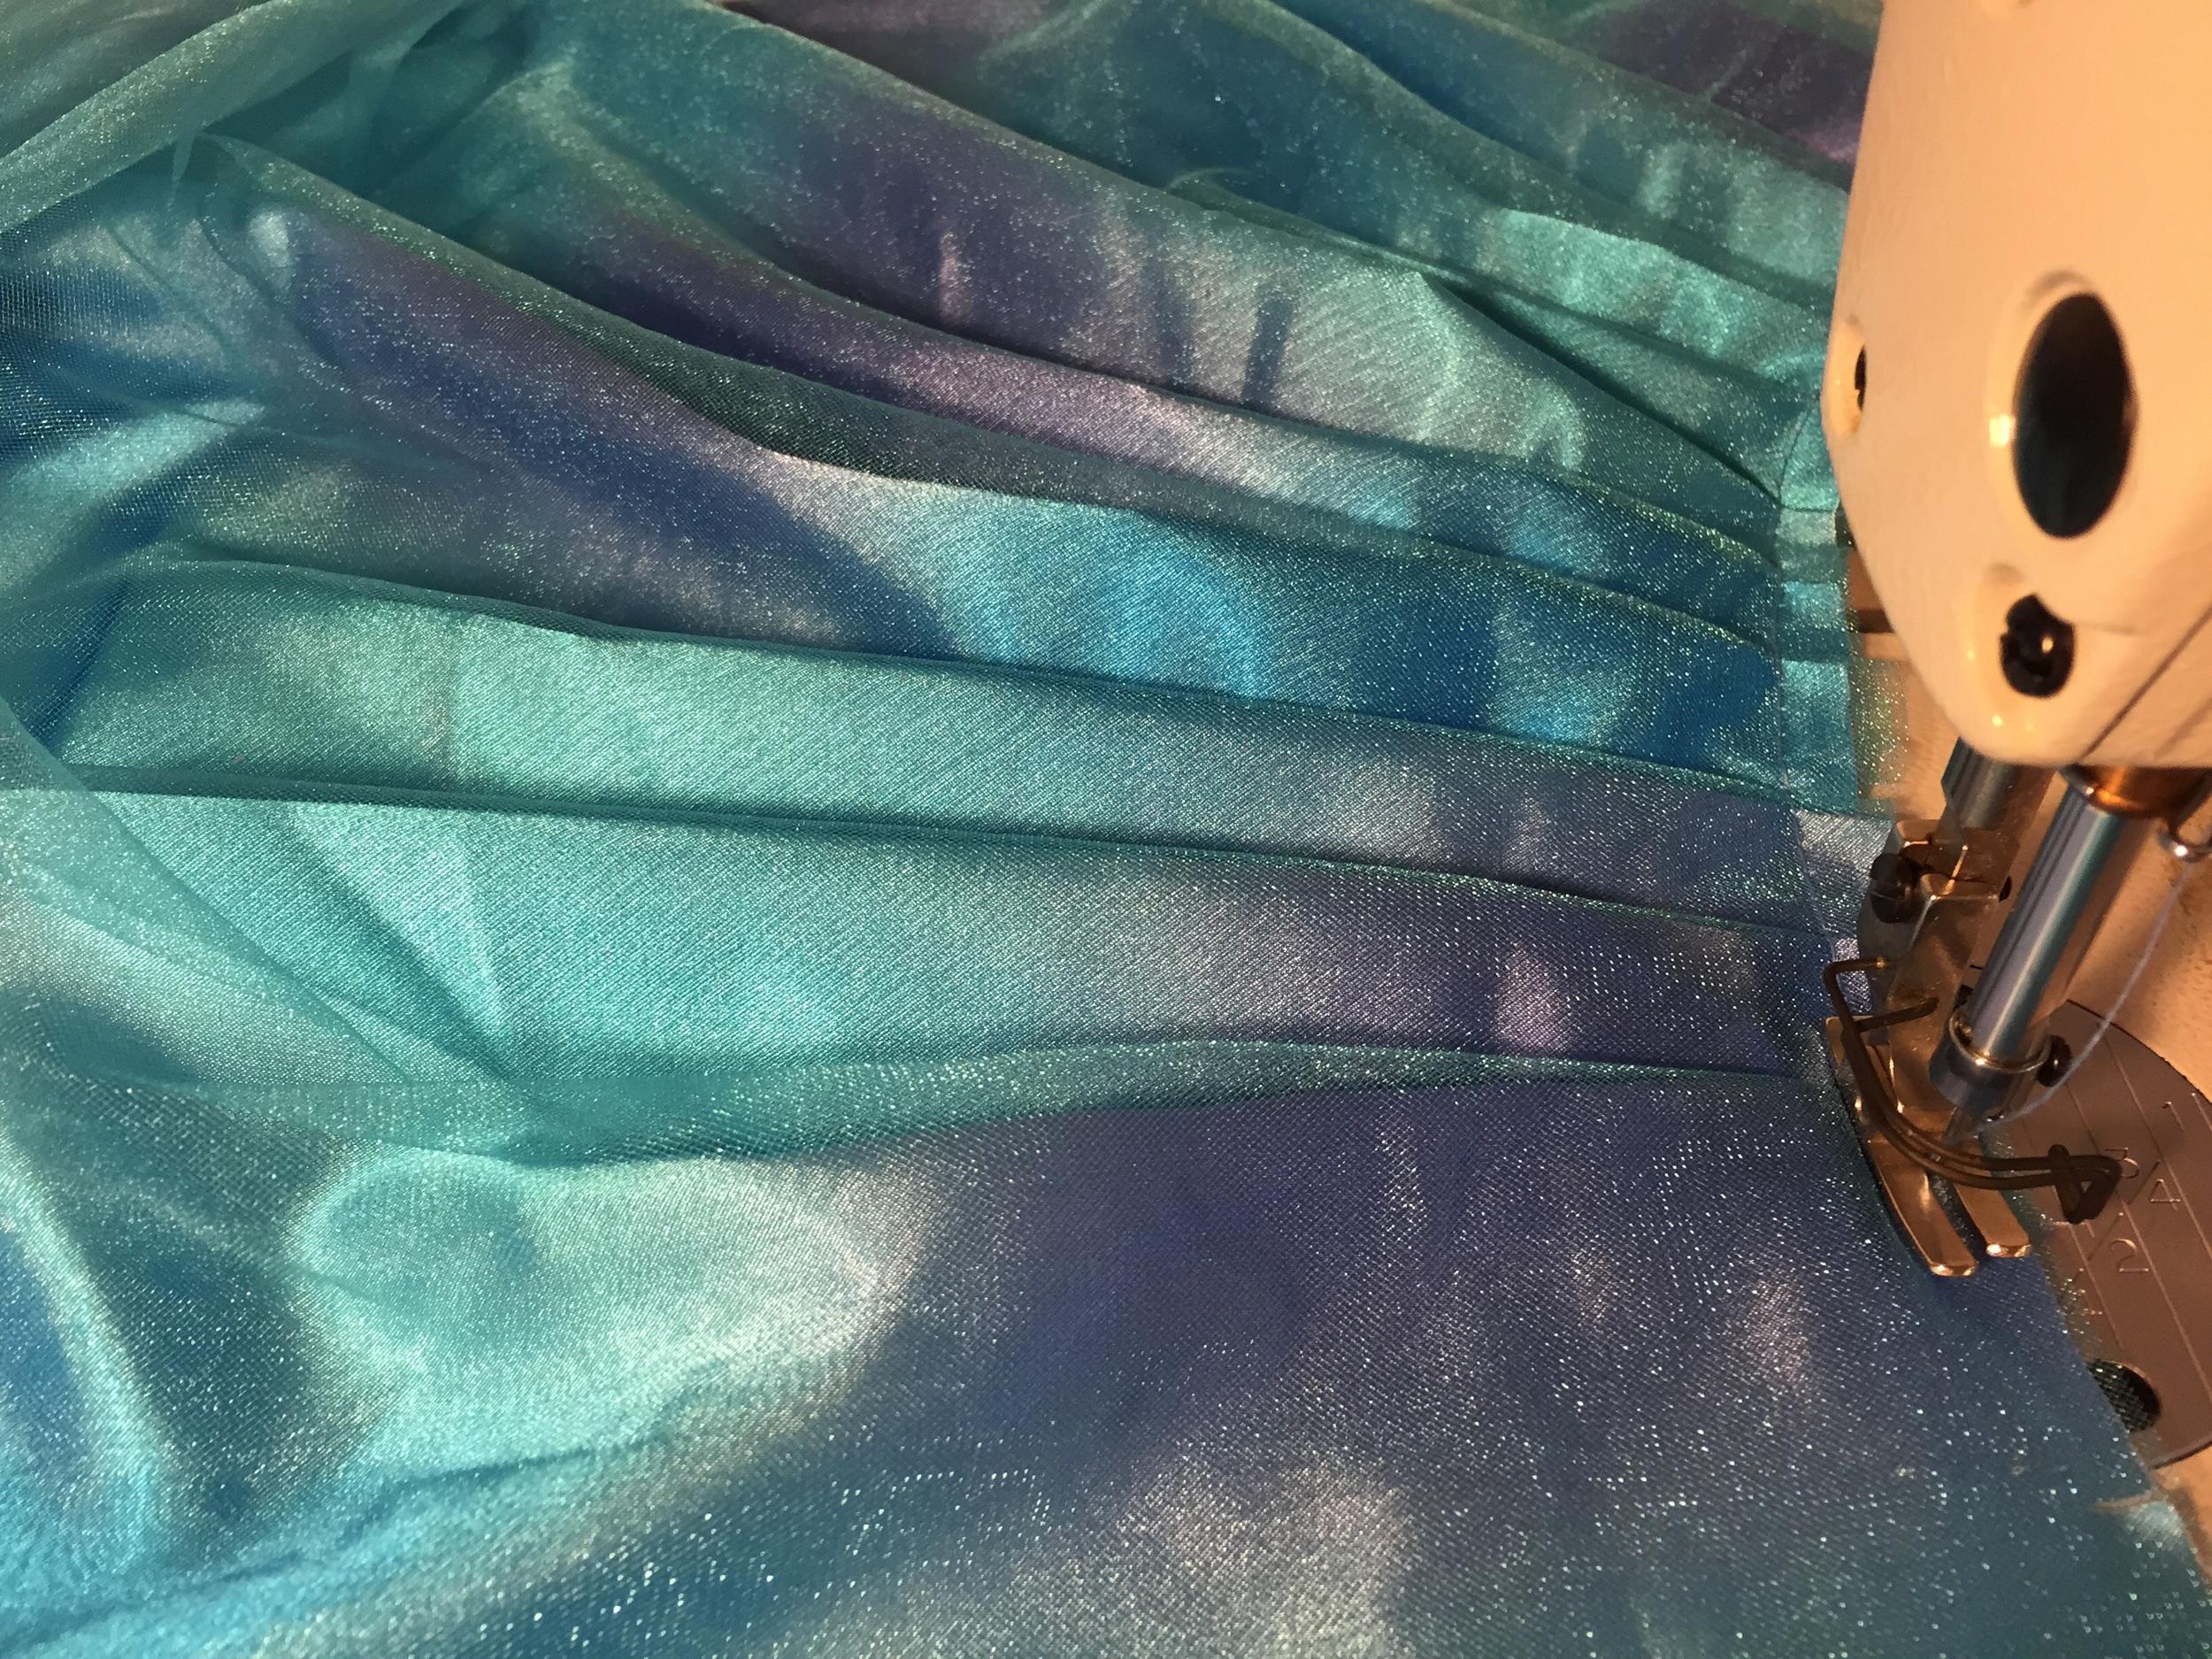 Pleated skirt to reduce fullness, while maximizing twirl power